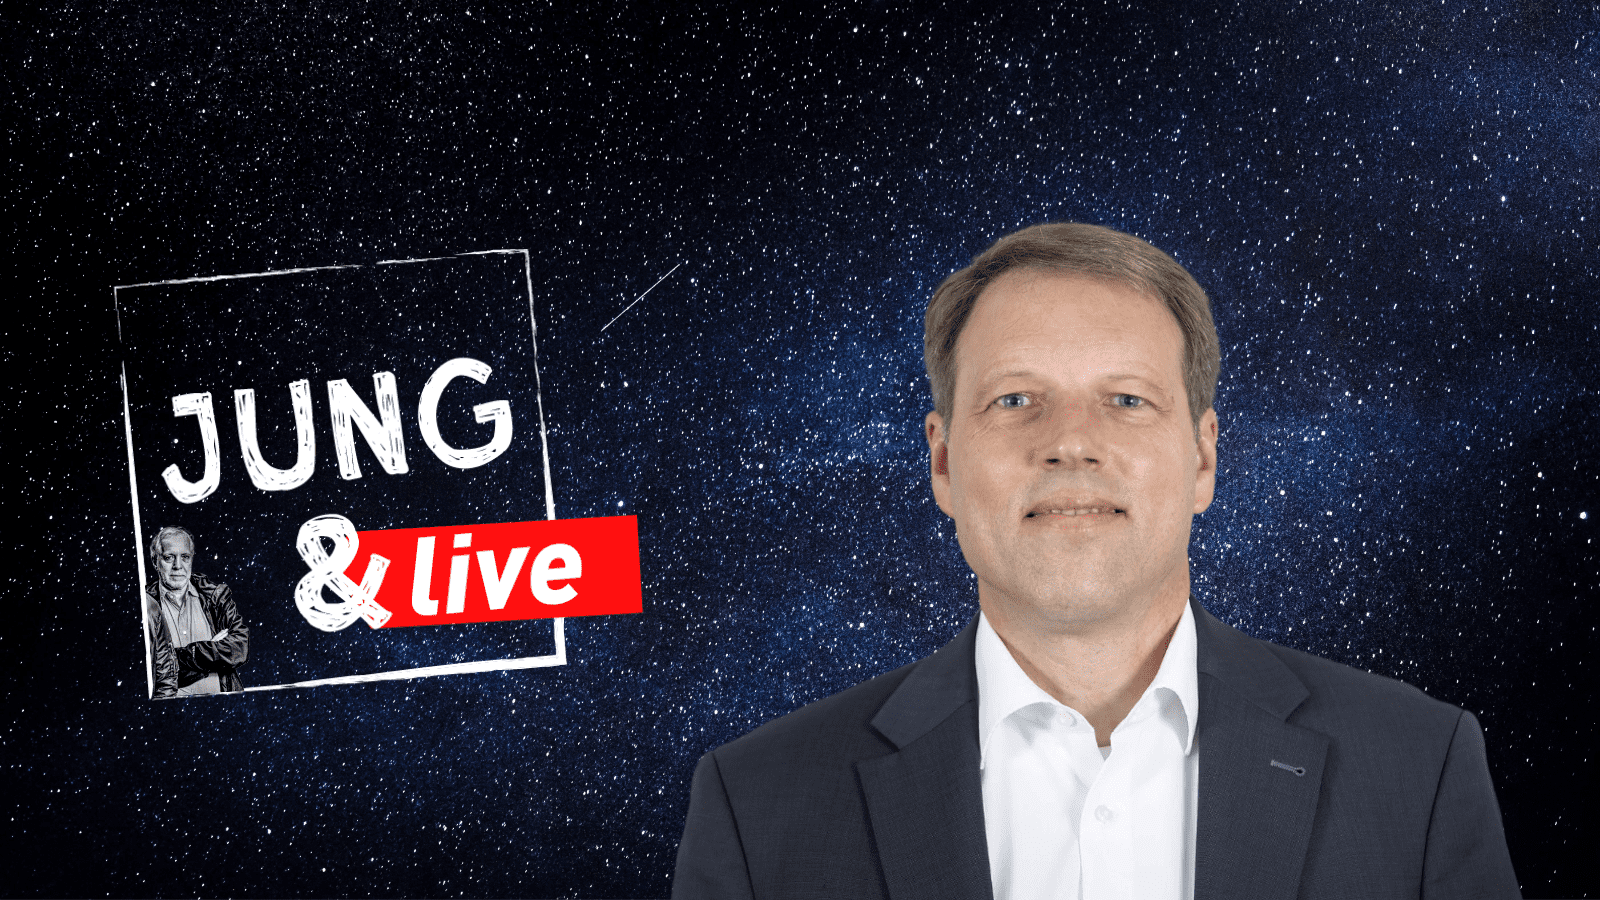 Jung&Live #21 mit Steuerexperte Stefan Bach (DIW)